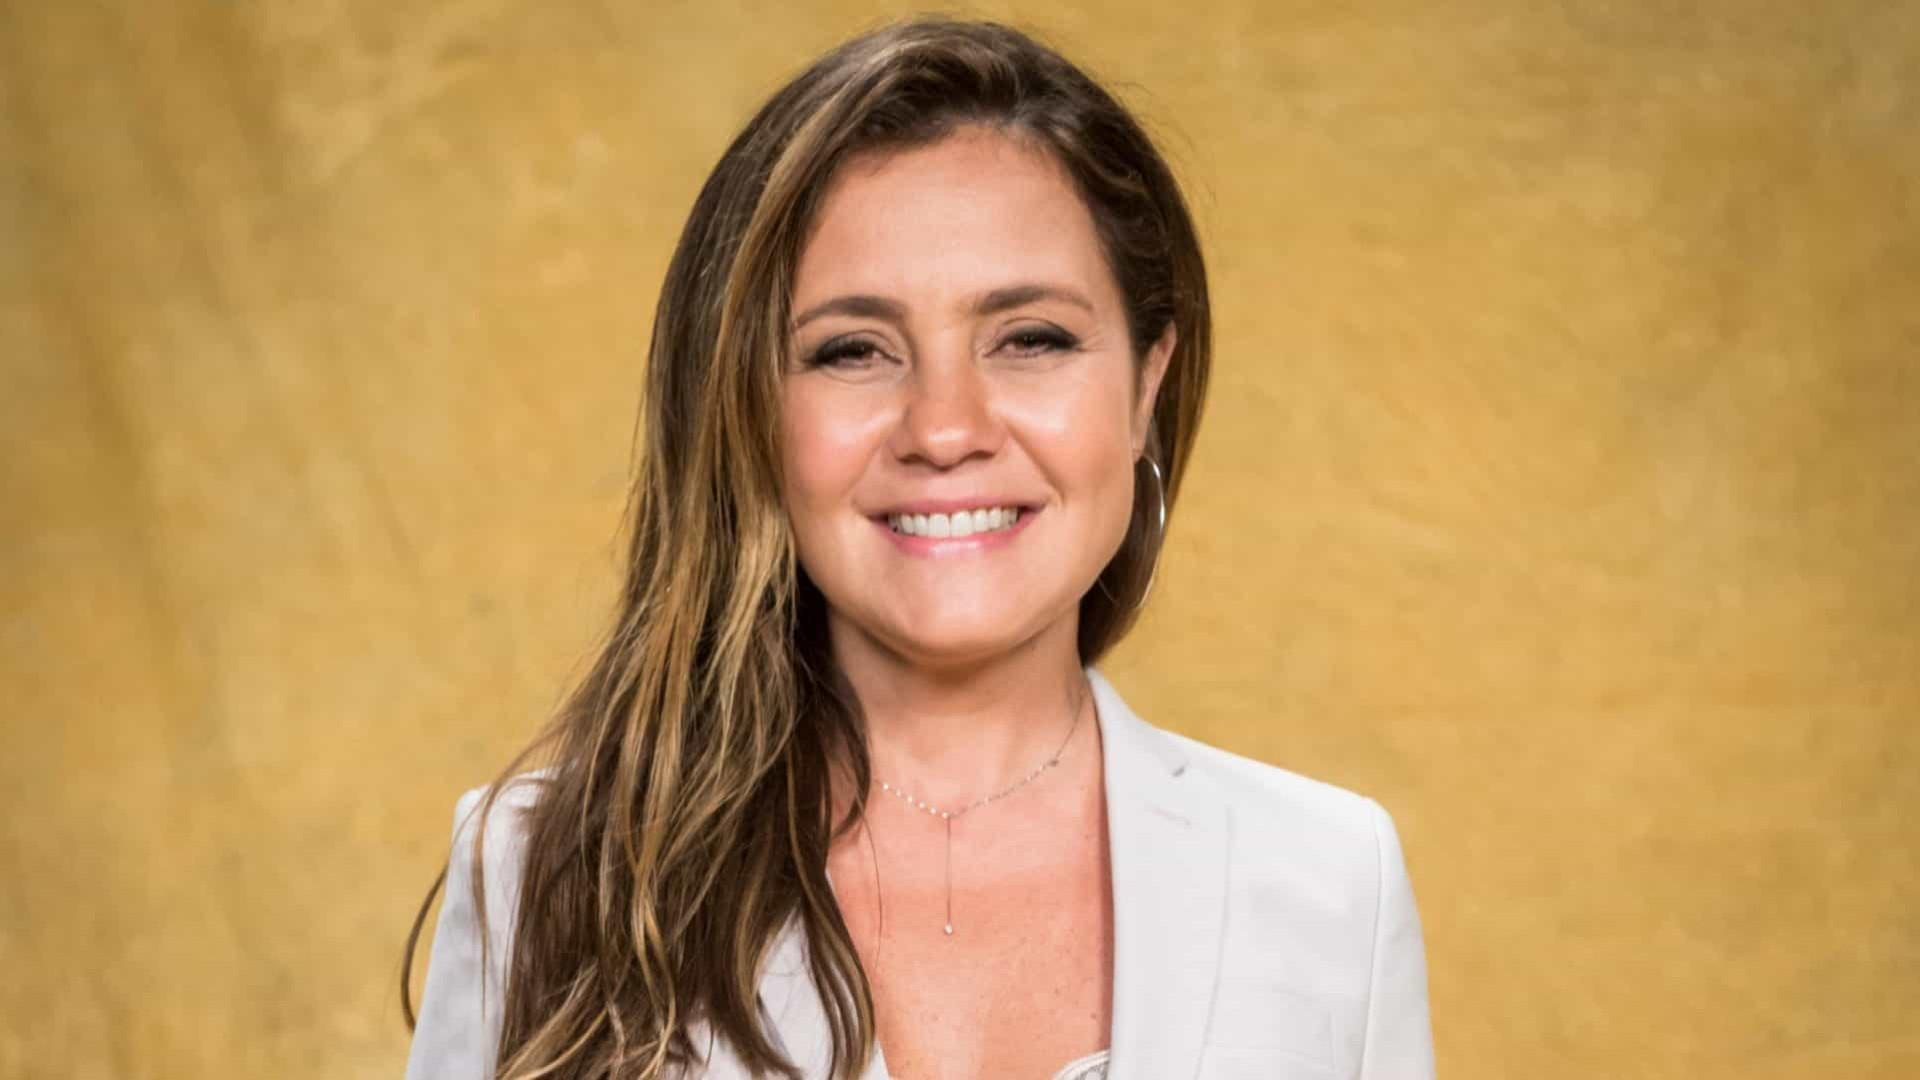 Adriana Esteves rebate internauta após pergunta machista